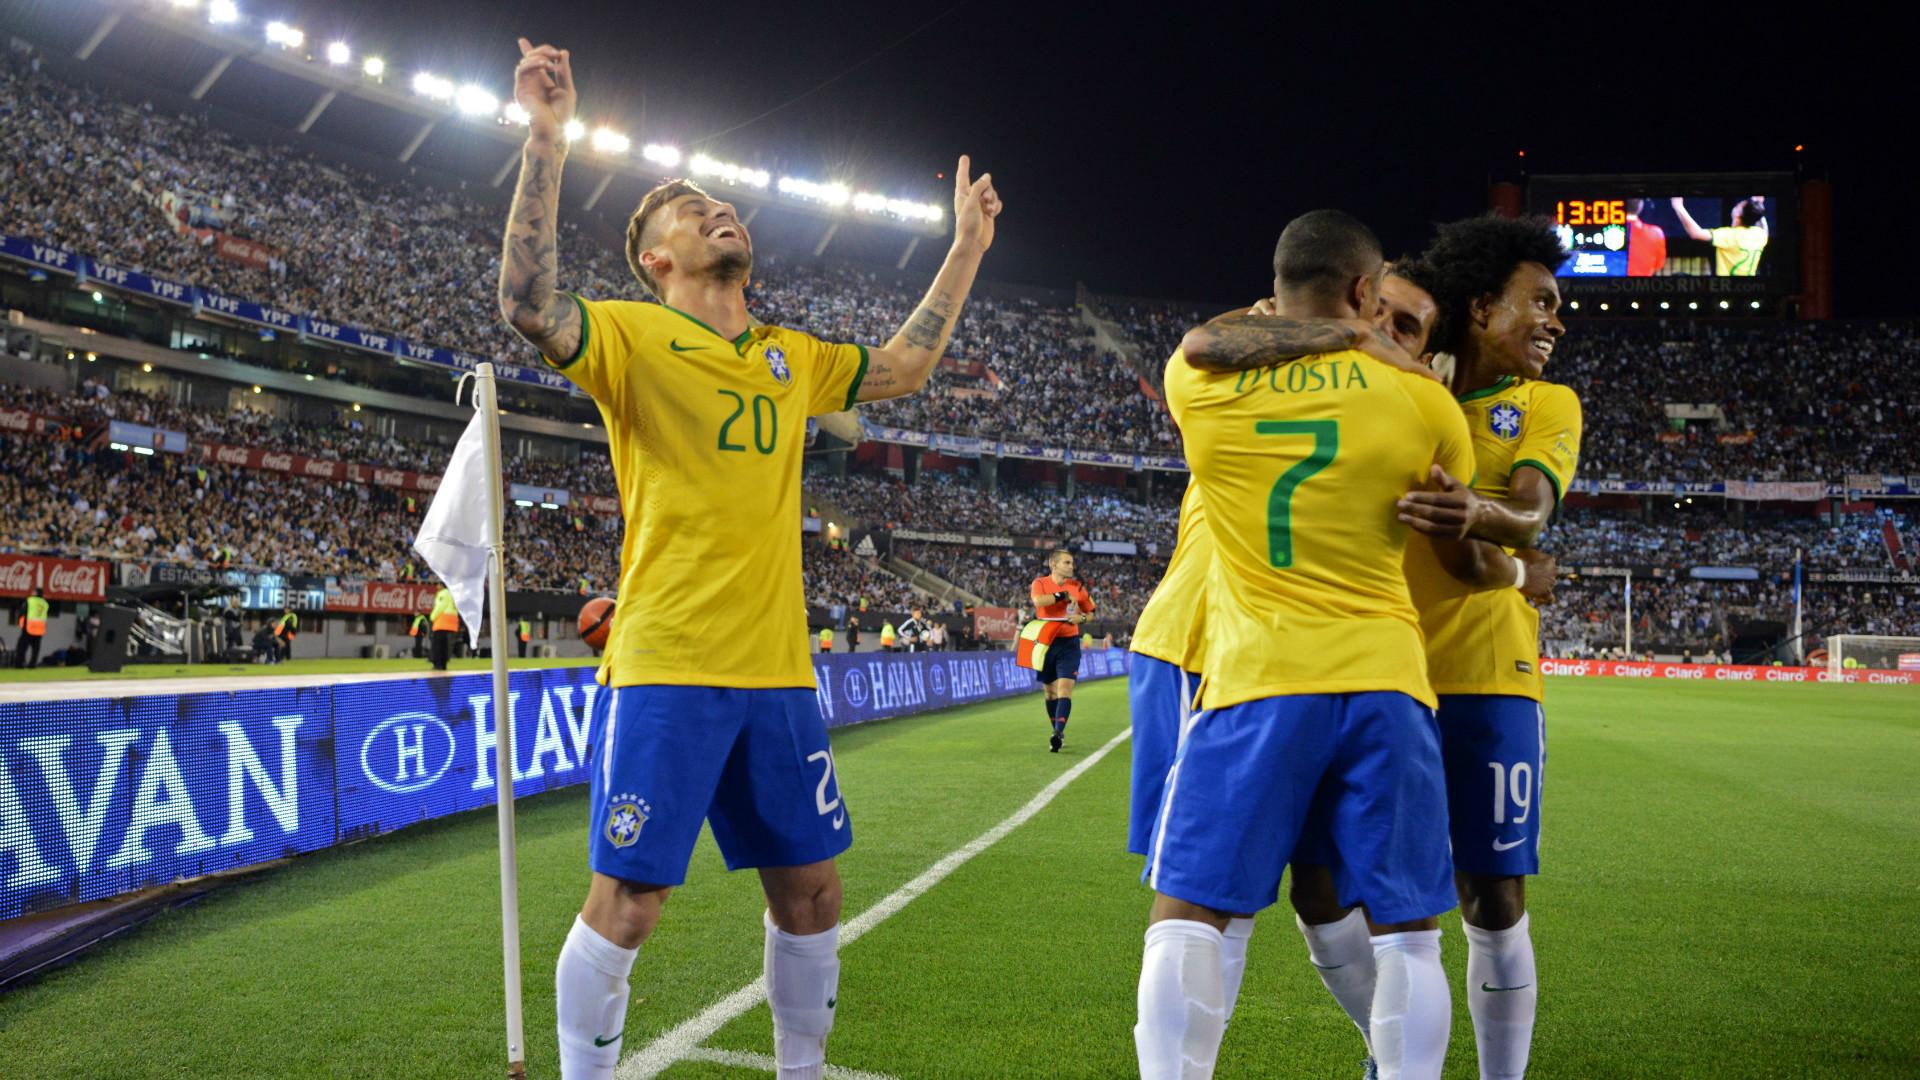 Argentina Vs Brasil: Brazil's World Cup Qualification